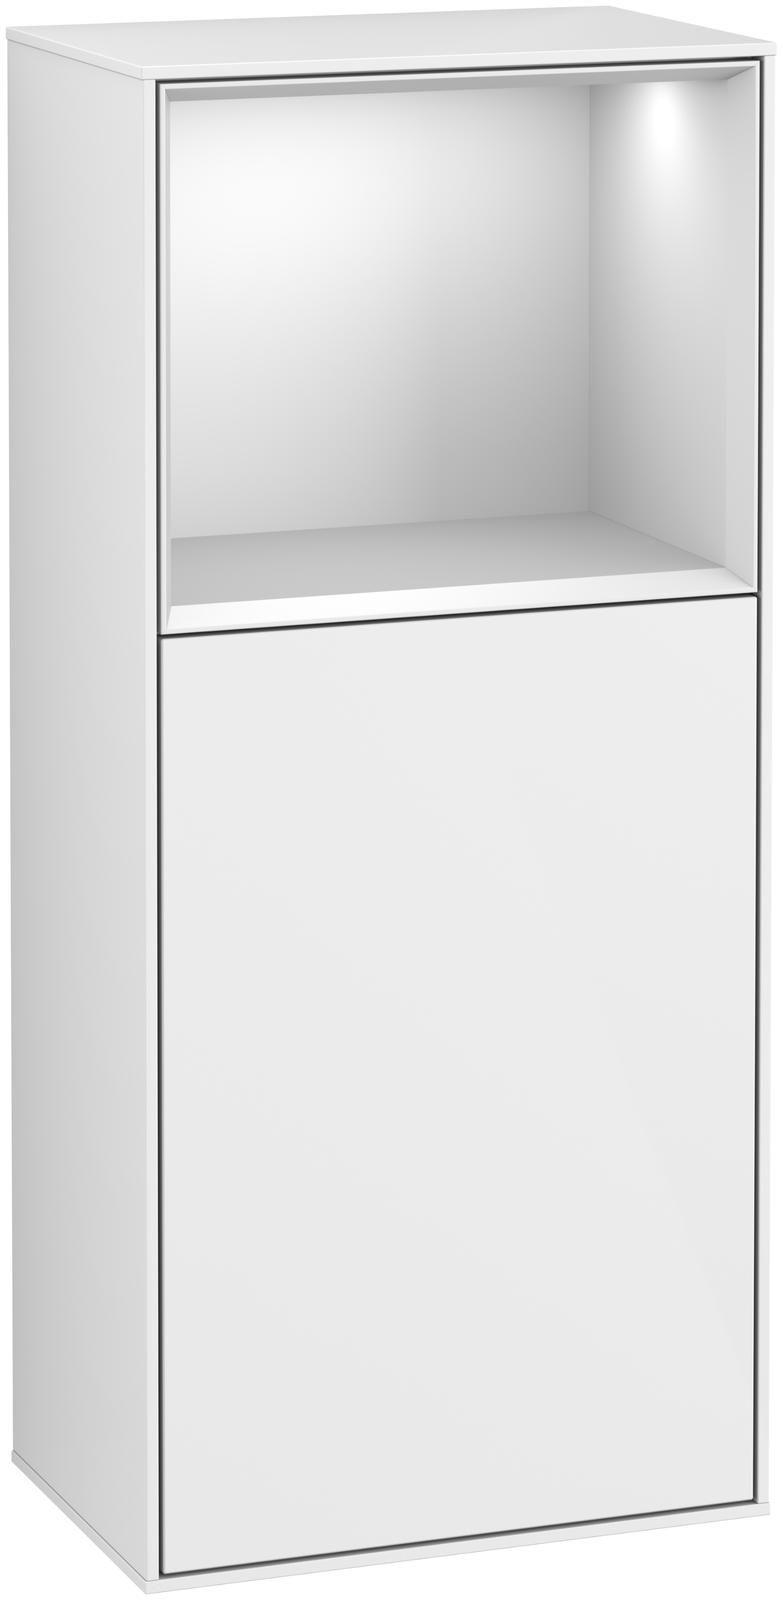 Villeroy & Boch Finion F51 Seitenschrank mit Regalelement 1 Tür Anschlag rechts LED-Beleuchtung B:41,8xH:93,6xT:27cm Front, Korpus: Glossy White Lack, Regal: Weiß Matt Soft Grey F510MTGF